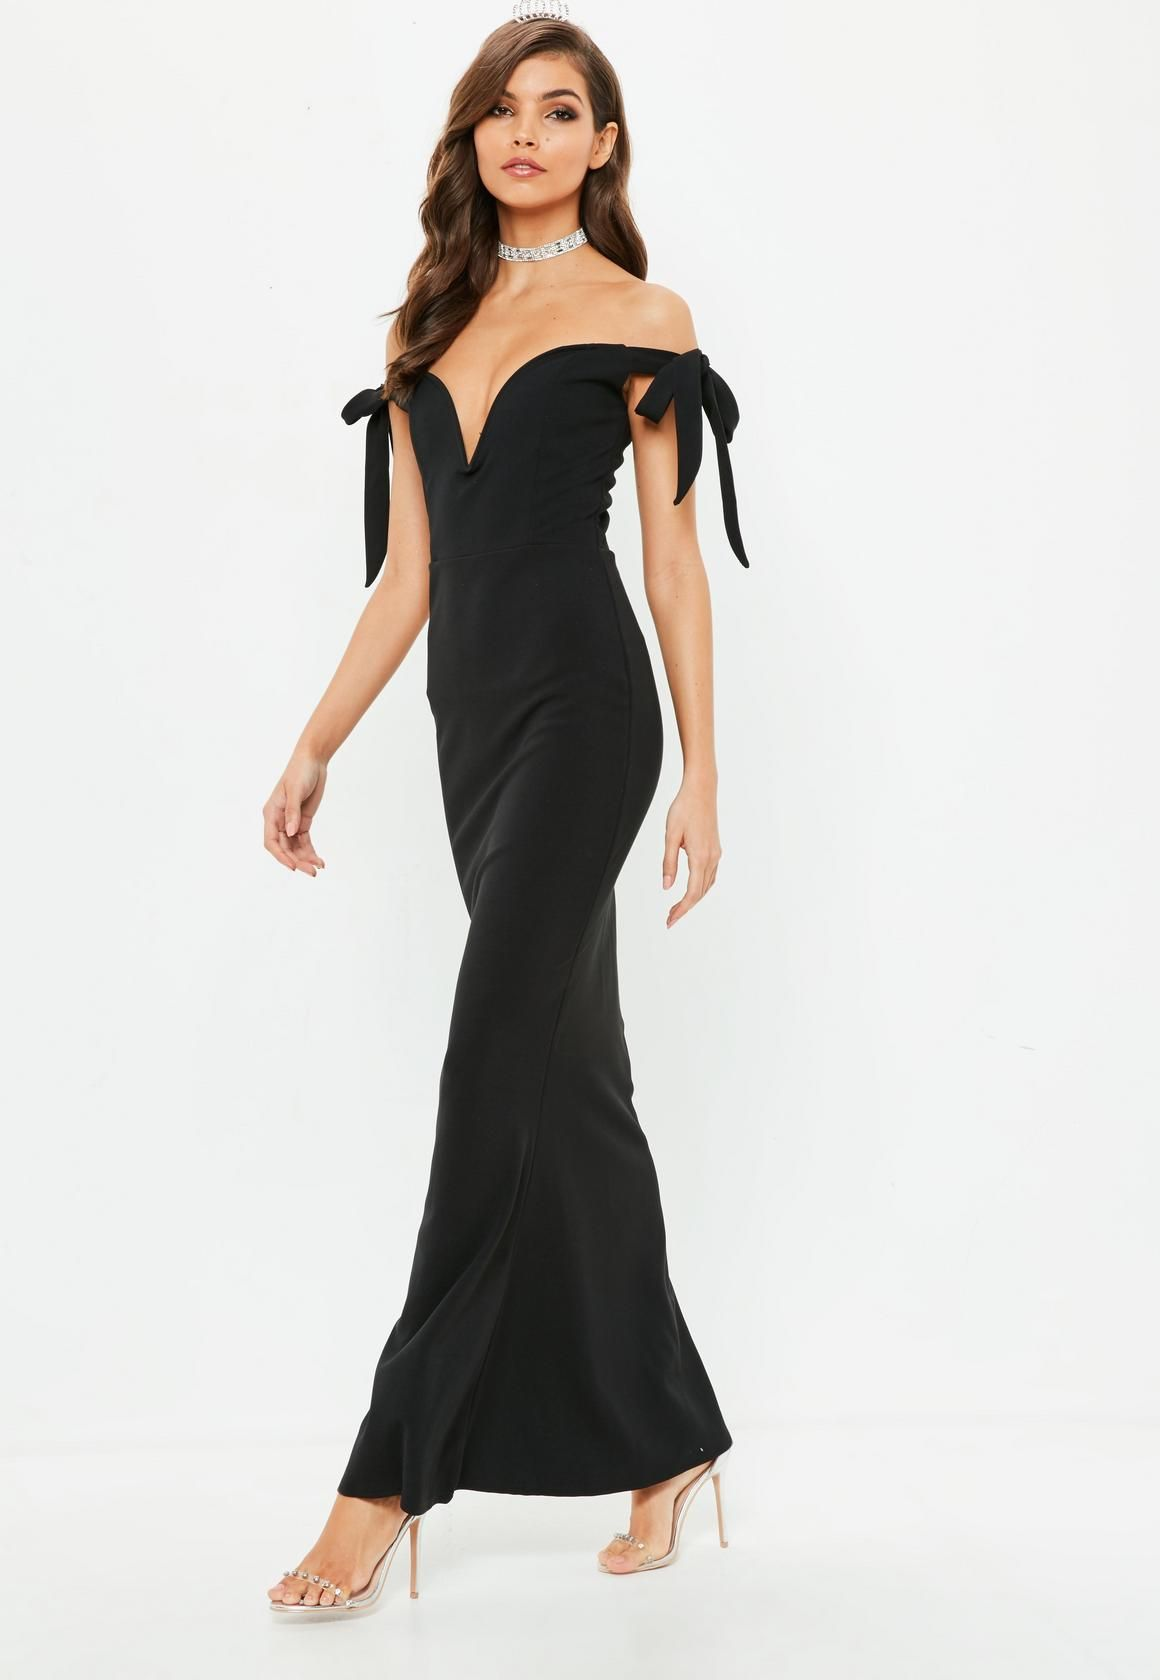 Missguided Black Sweetheart Neck Bardot Tie Maxi Dress Trending Dresses Dresses Tie Maxi Dress [ 1680 x 1160 Pixel ]